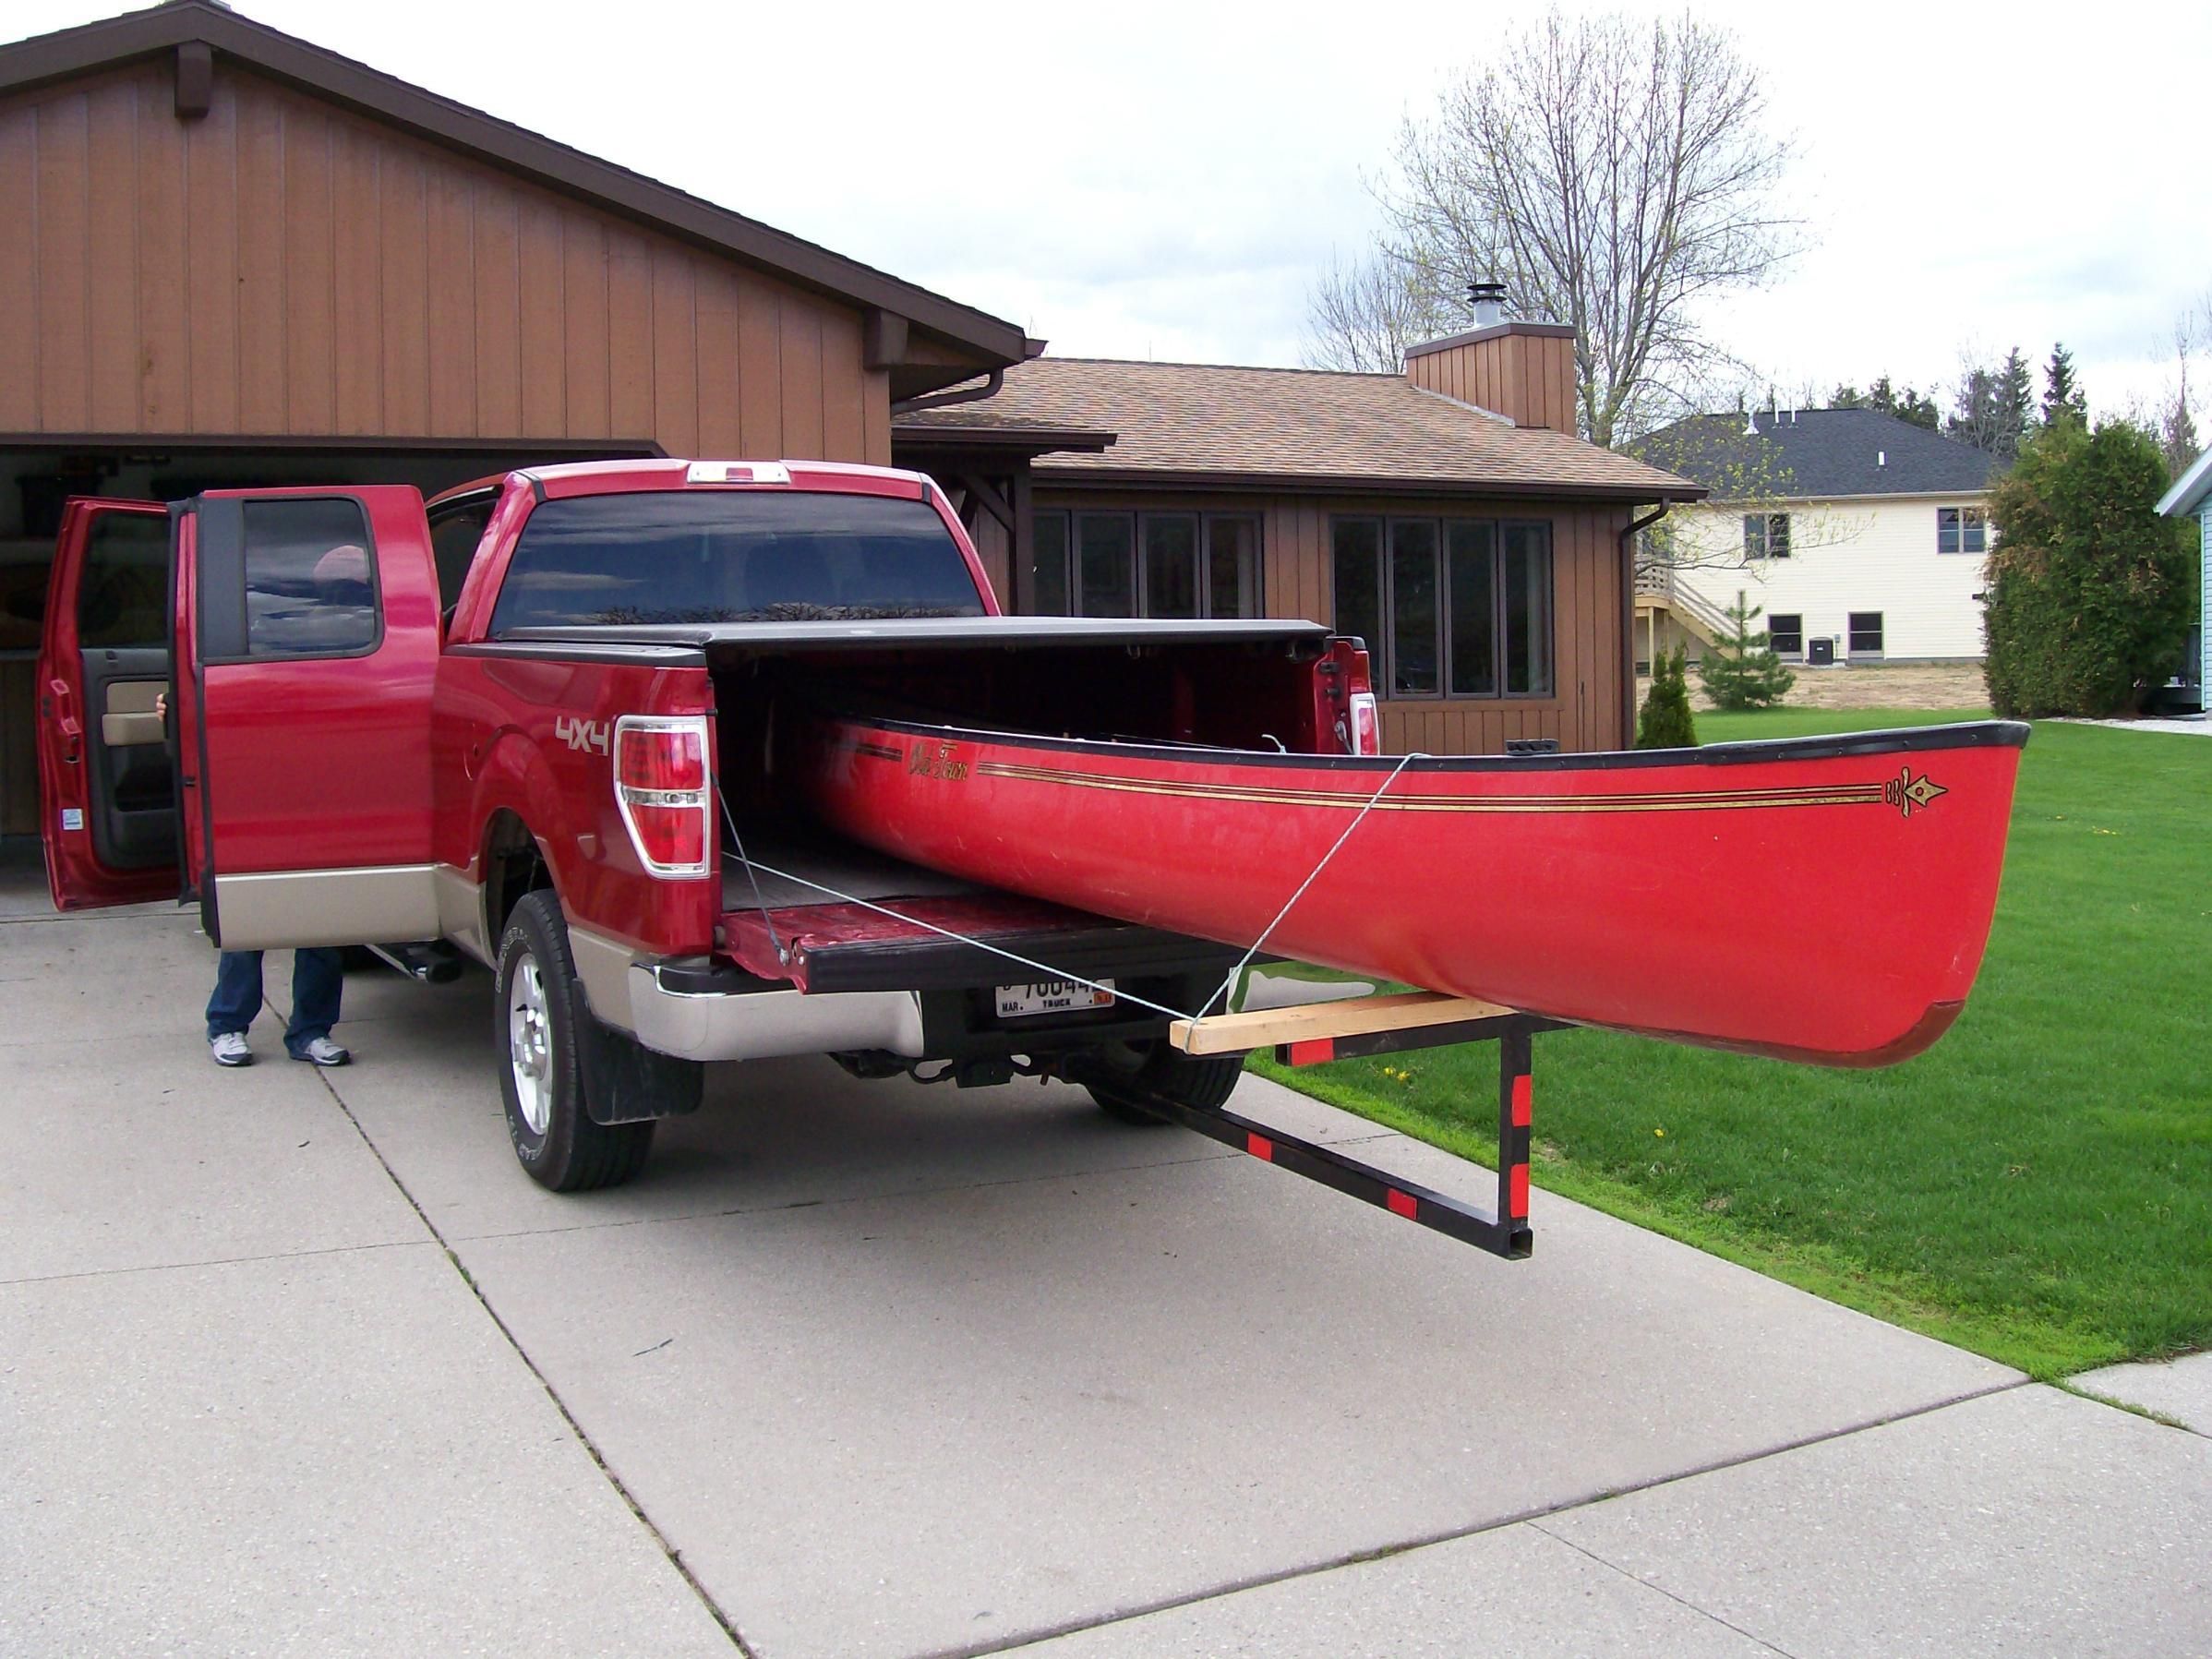 BWCA Canoe Rack/Carrier for my Truck Boundary Waters Gear